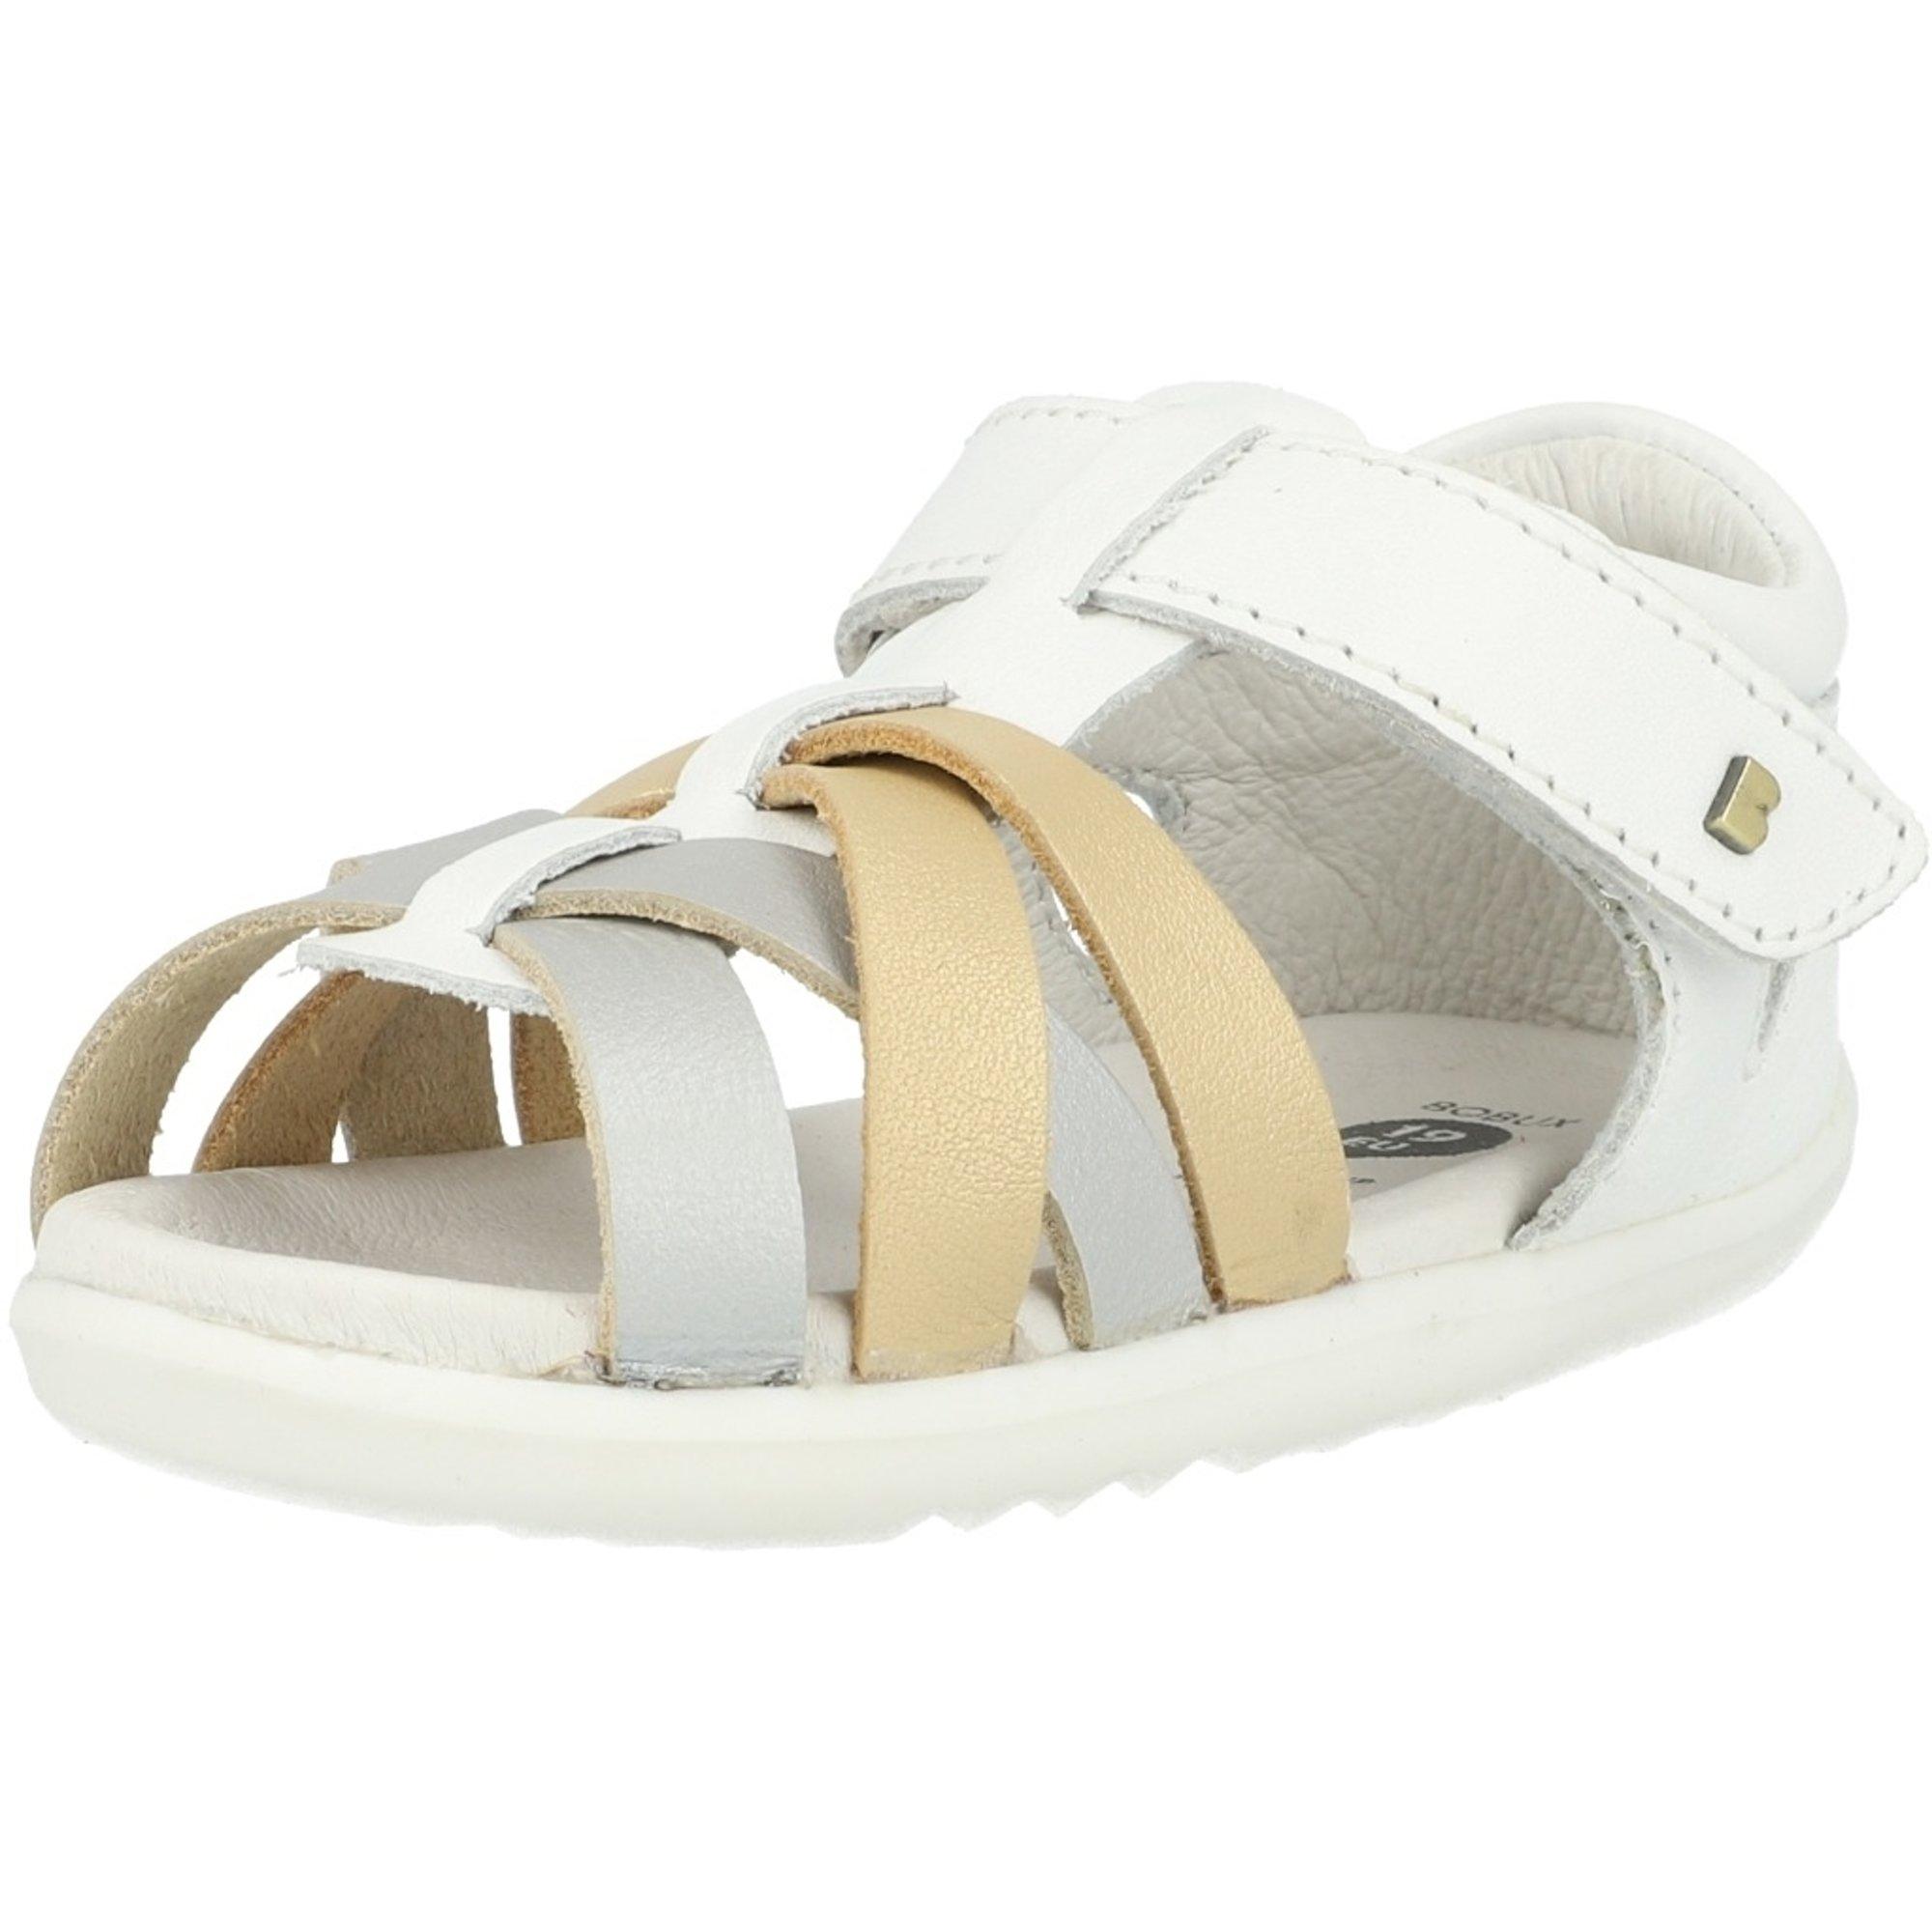 Little Kid//Big Kid Chad Gold Boys Girls Slide Sandals Anti-Slip Stylish Beach Sandals Shower Shoes